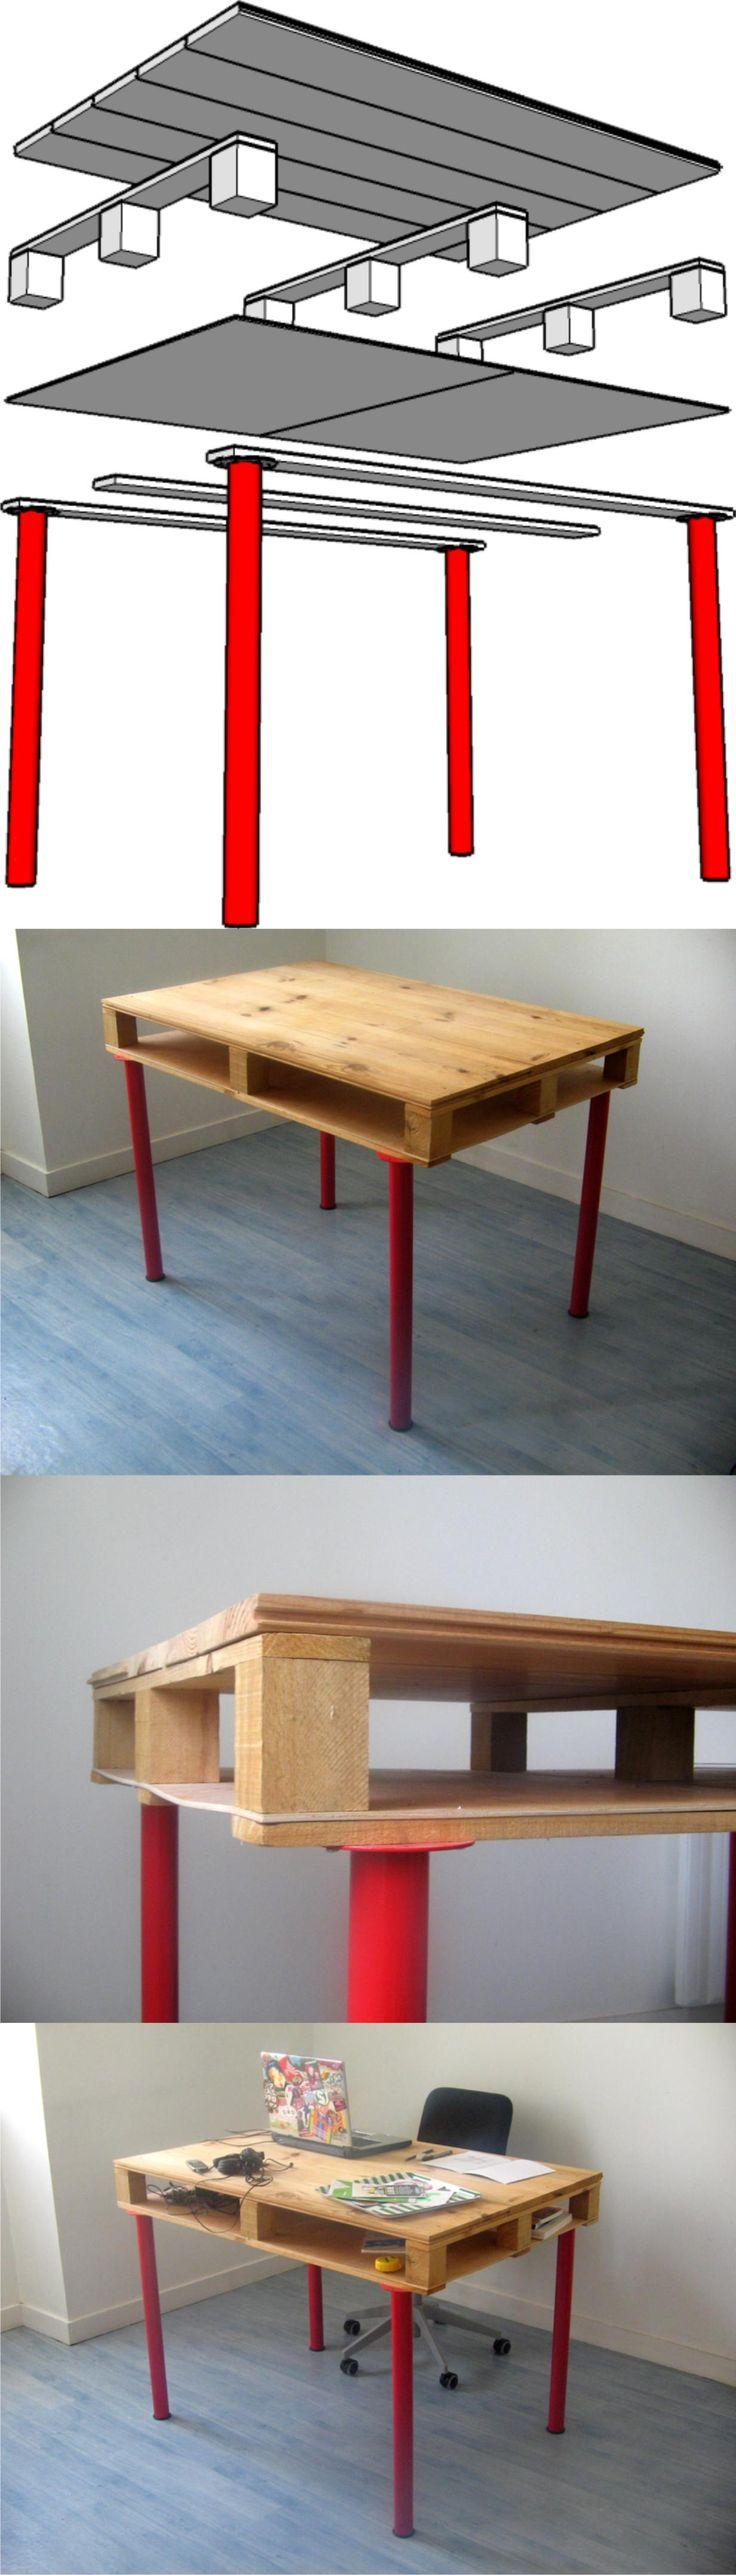 Mesa de escritorio con un palé | Muy Ingenioso